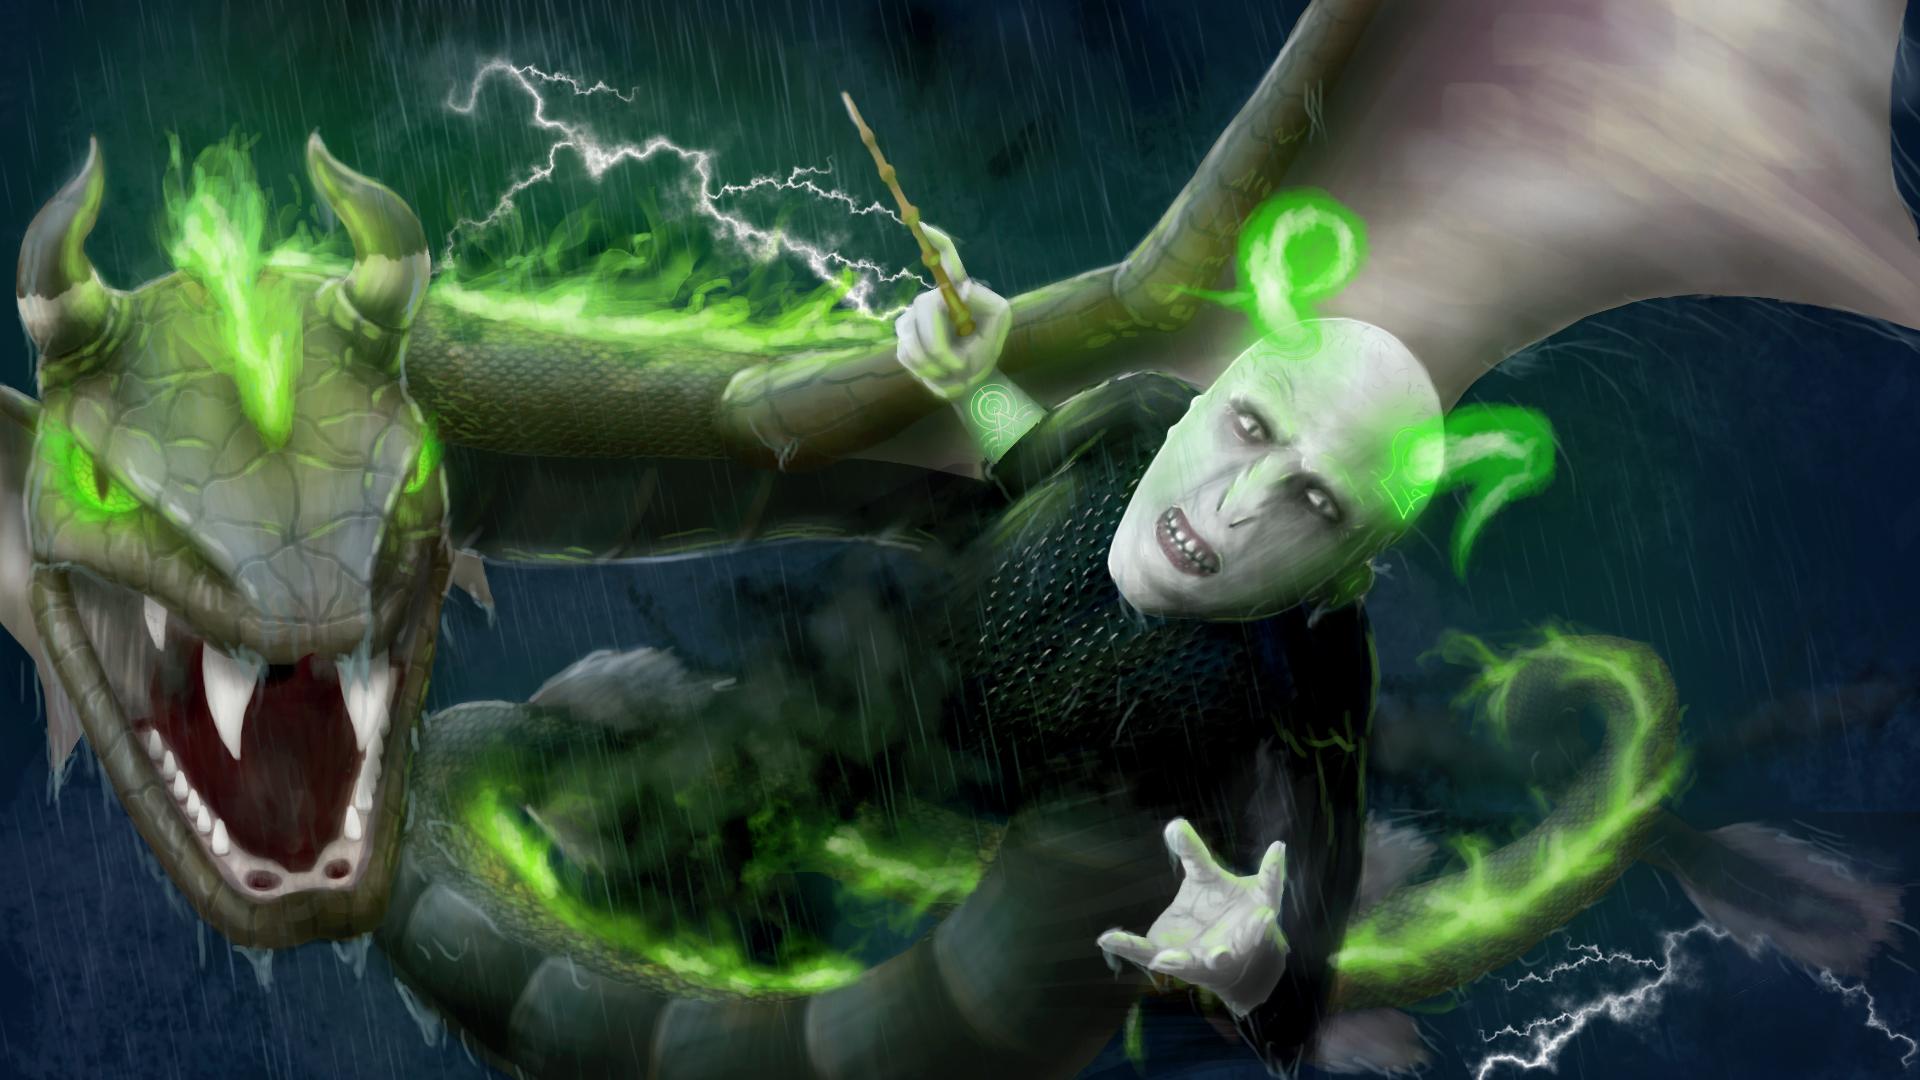 Voldemort and Nagini back at it again!